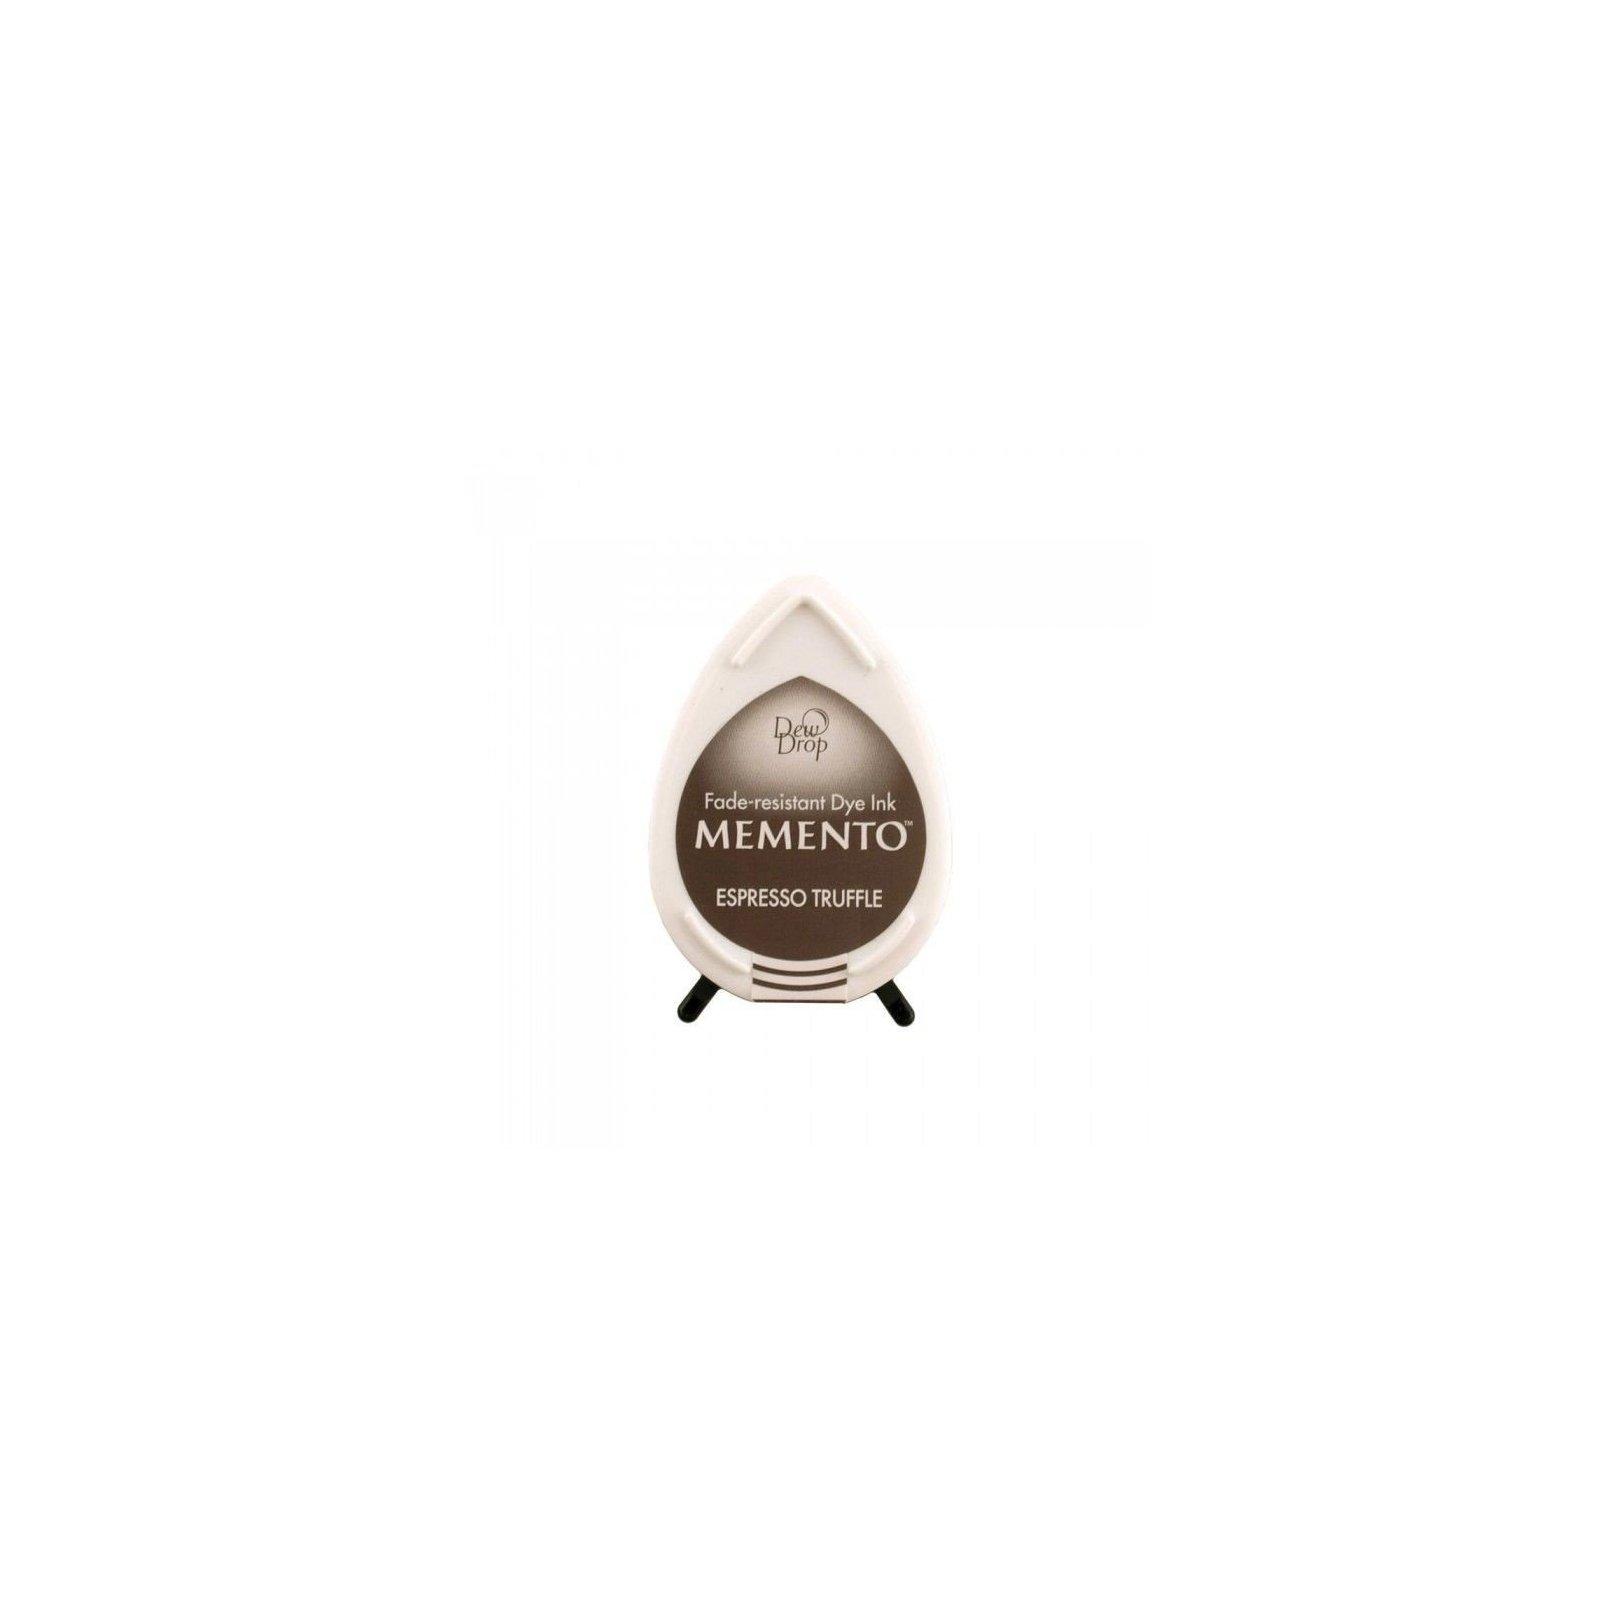 Mini encreur marron Memento Dew Drop - Espresso Truffle - Tsukineko